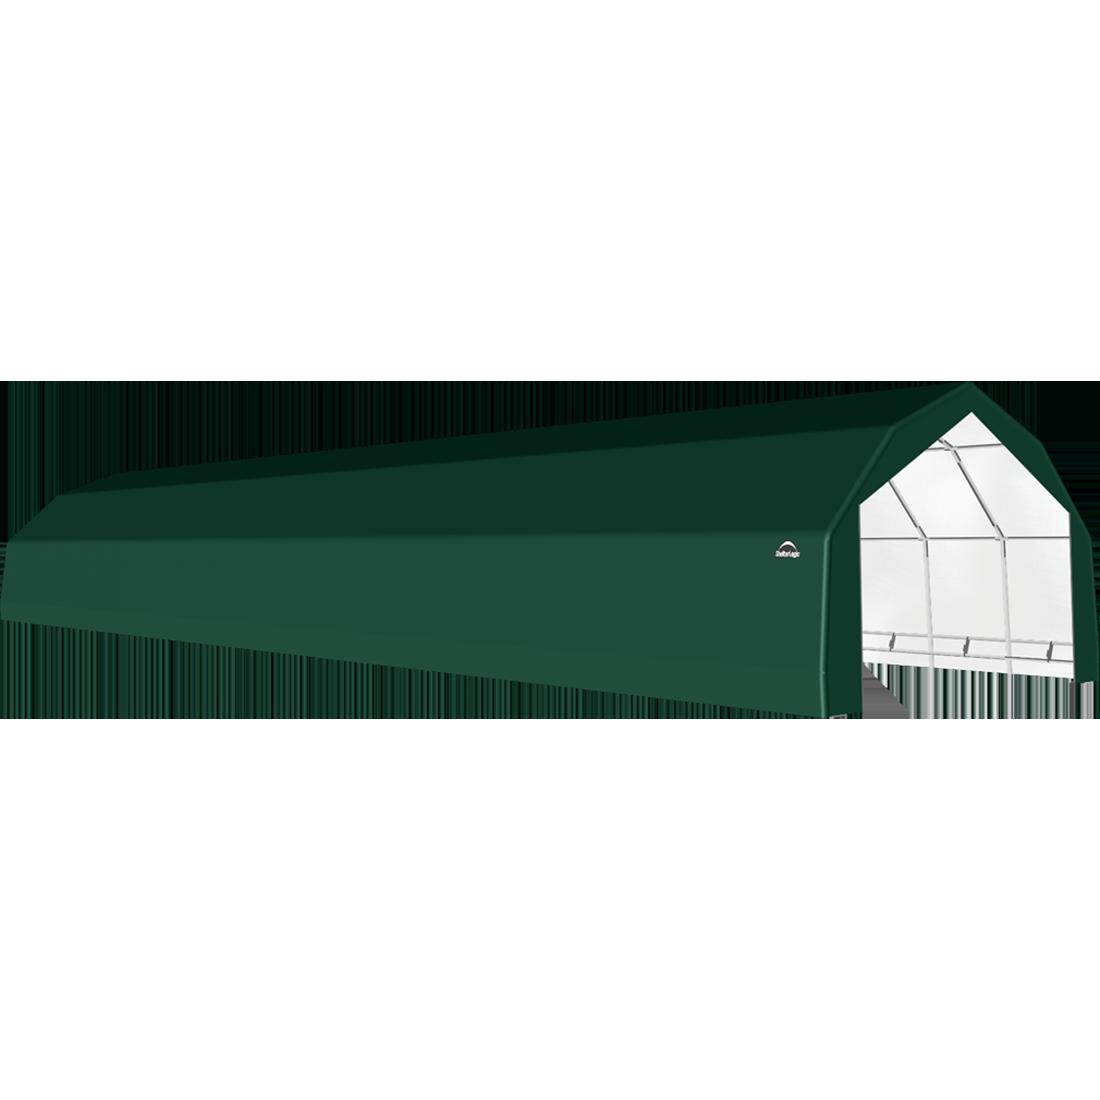 ShelterTech SP Series Barn Shelter, 20 ft. x 72 ft. x 12 ft. Heavy Duty PVC 14.5 oz. Green